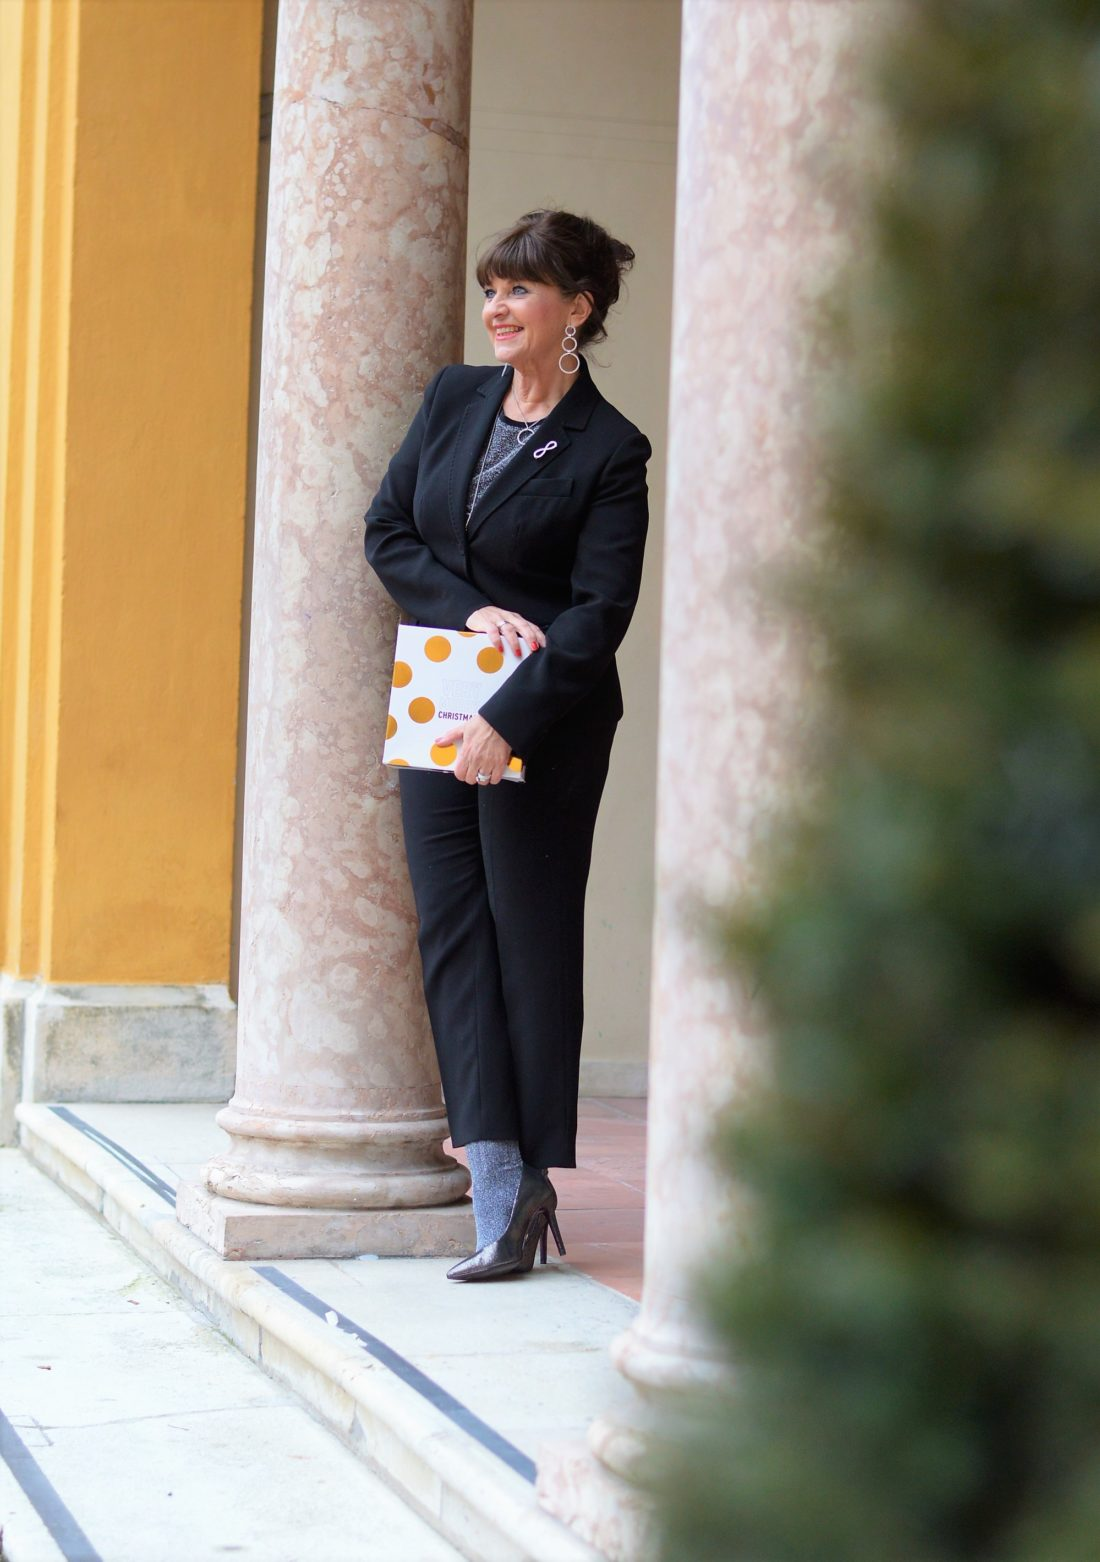 Martina Berg - Lady 50plus - Fashion   Lifestyle Blog für Frauen 50plus 0d8bb51d5e